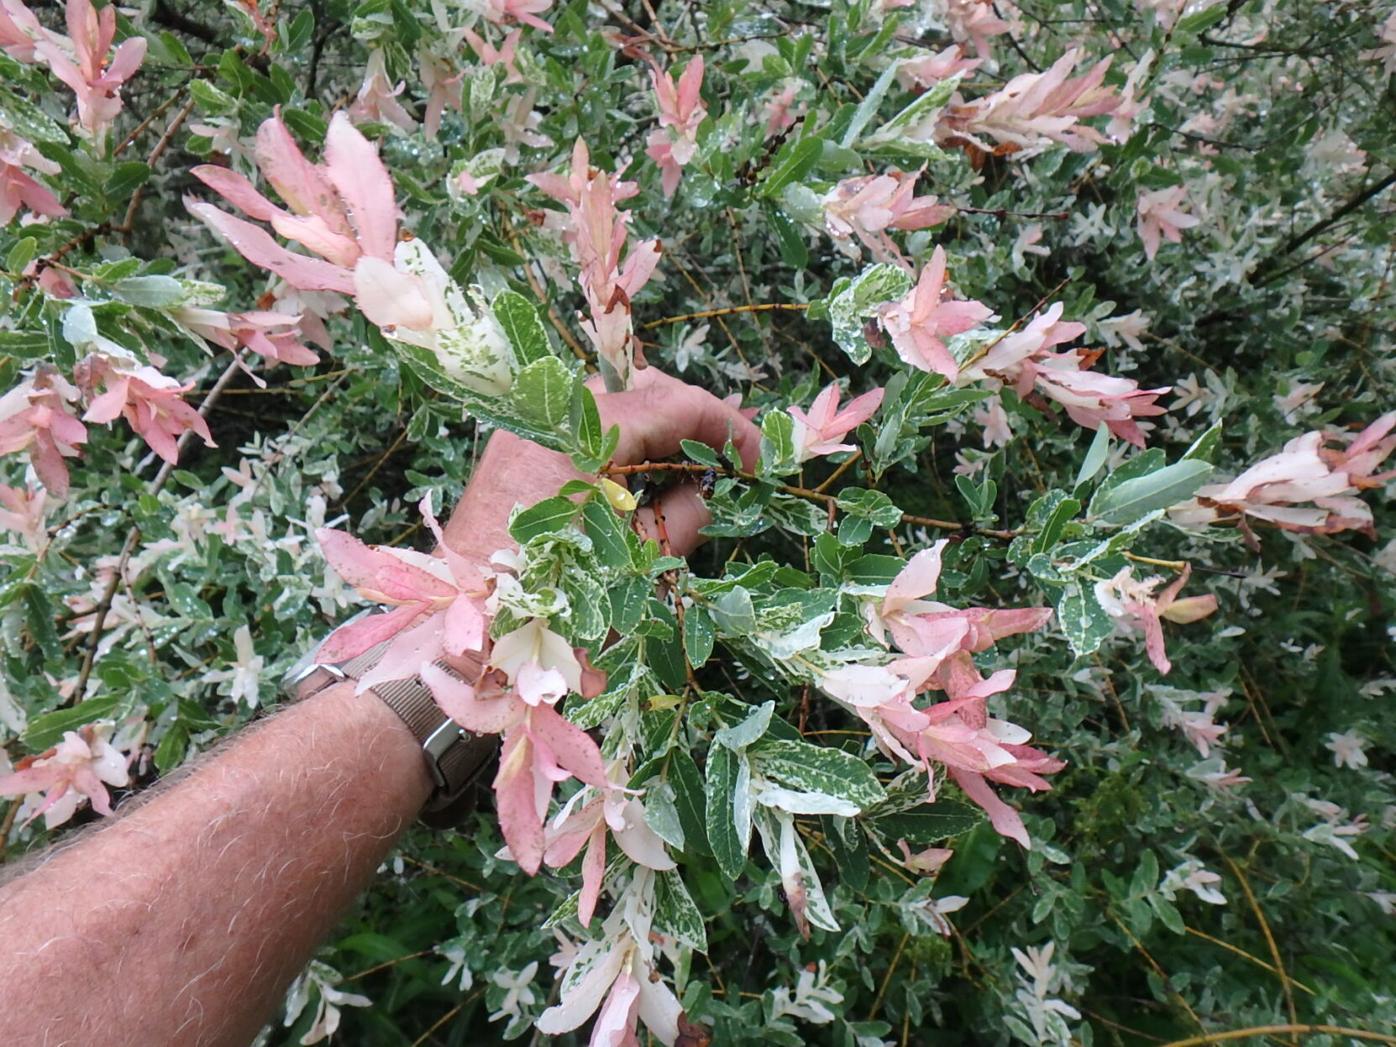 Hakuru nashiki willows do not produce pussy willows or allergic reactions .JPG